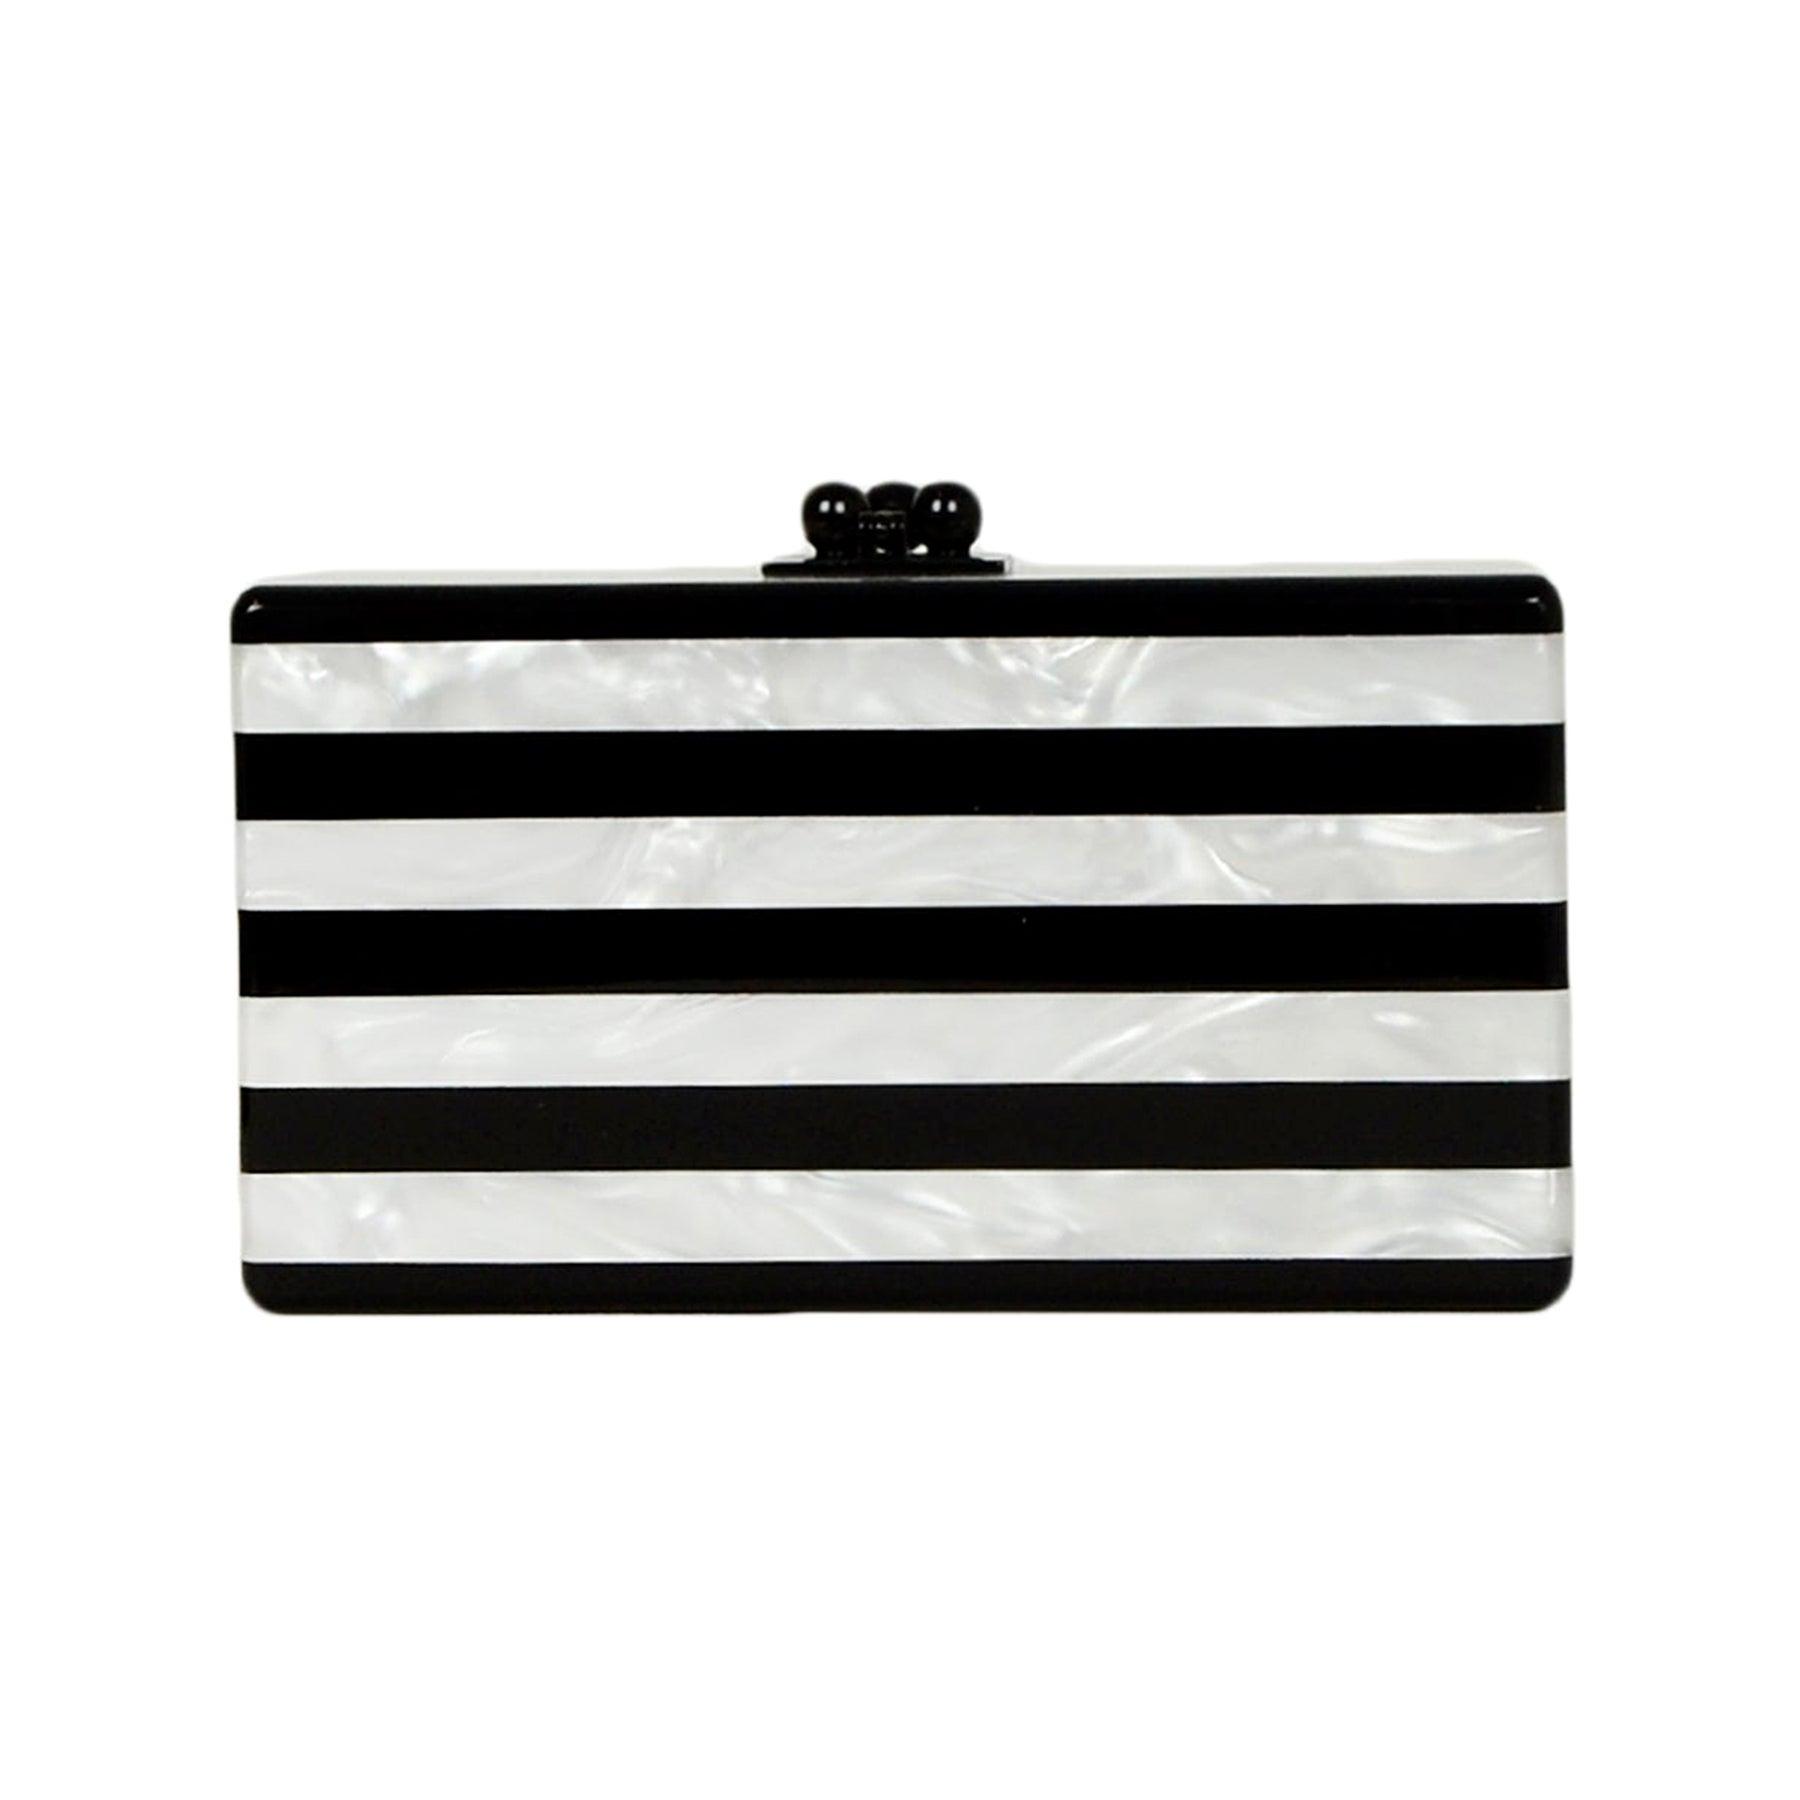 Edie Parker Black/White Stripe Acrylic Marble Minaudiere Clutch Bag